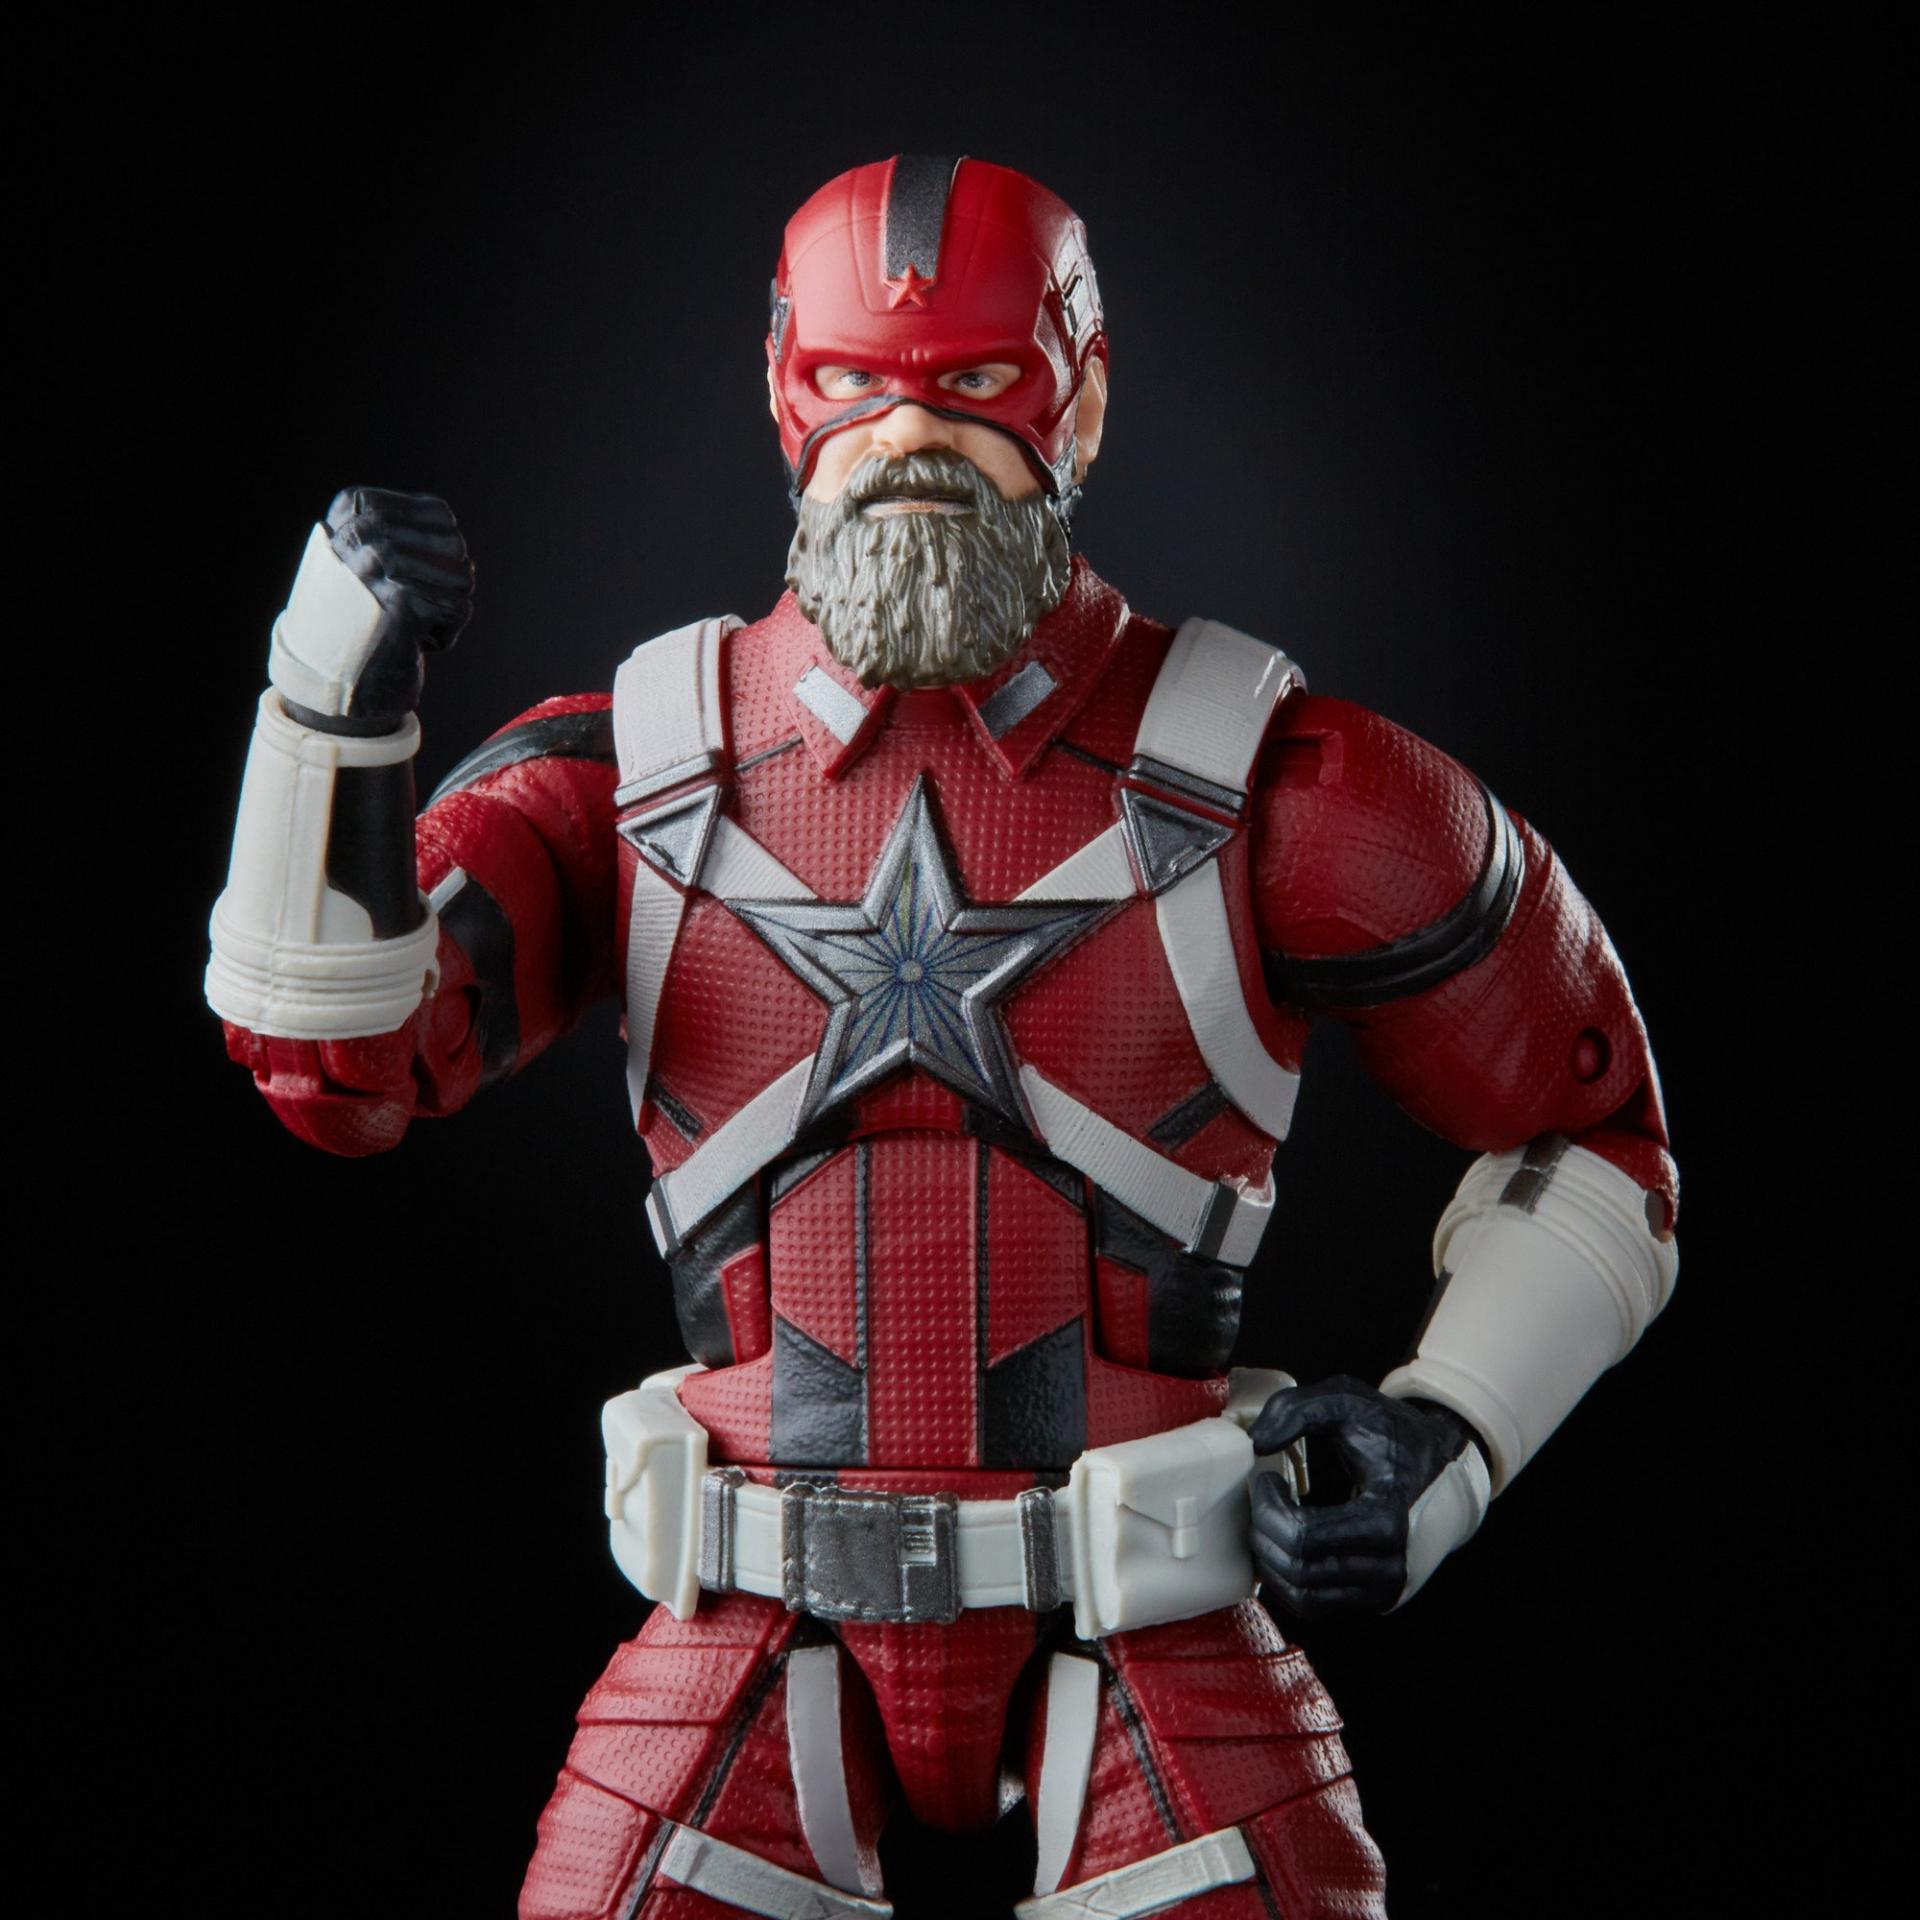 Marvel legends series hasbro red guardian melina vostkoff 2 pack5